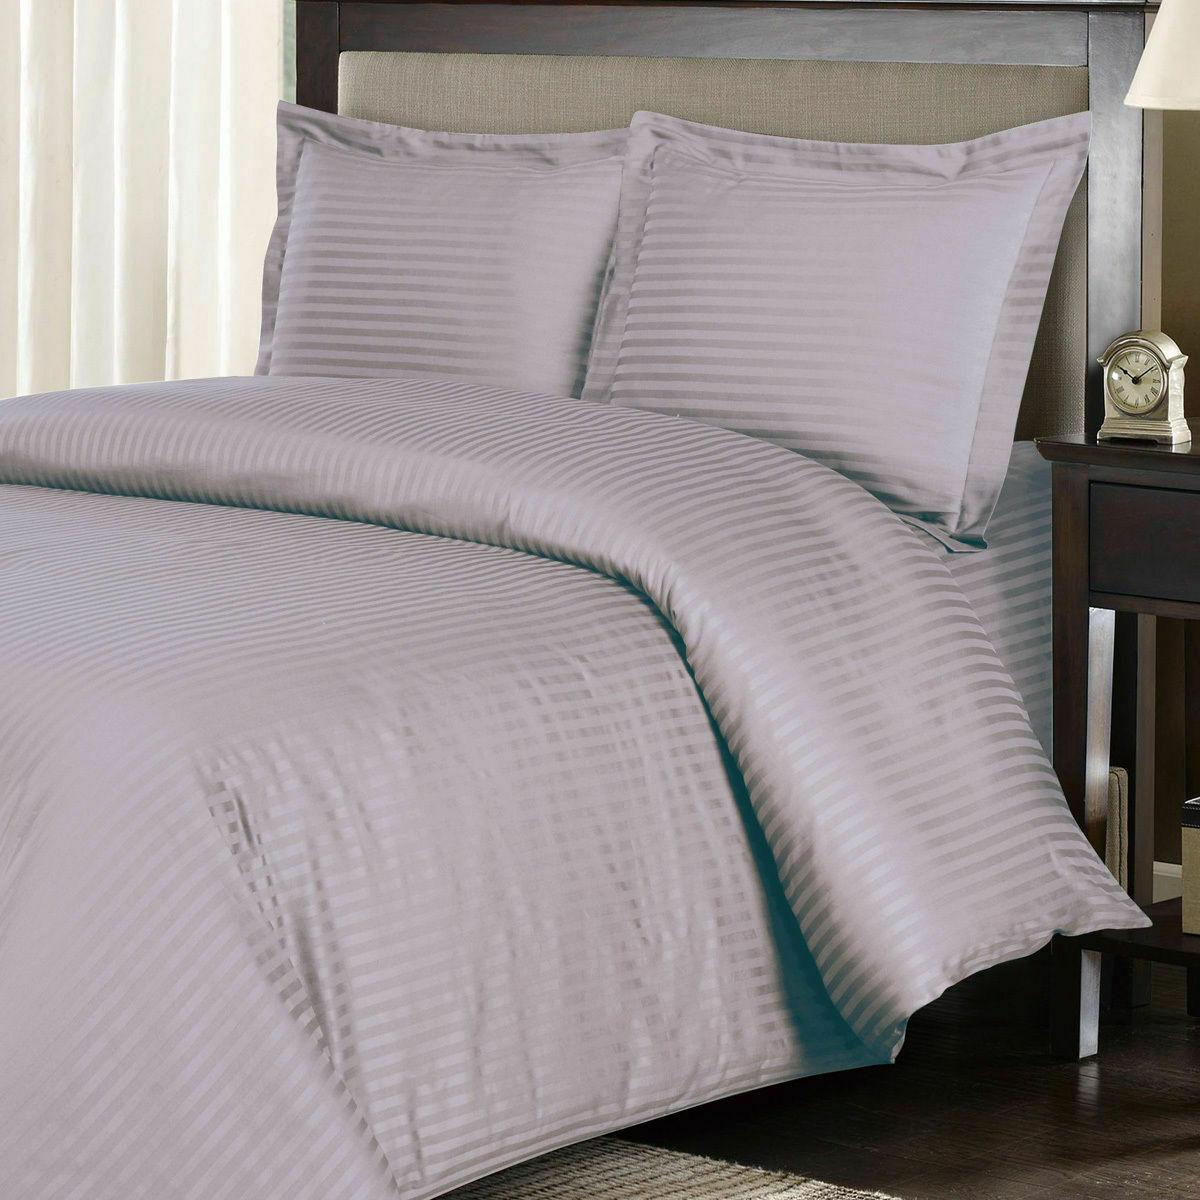 100 percent cotton striped pattern elegant duvet